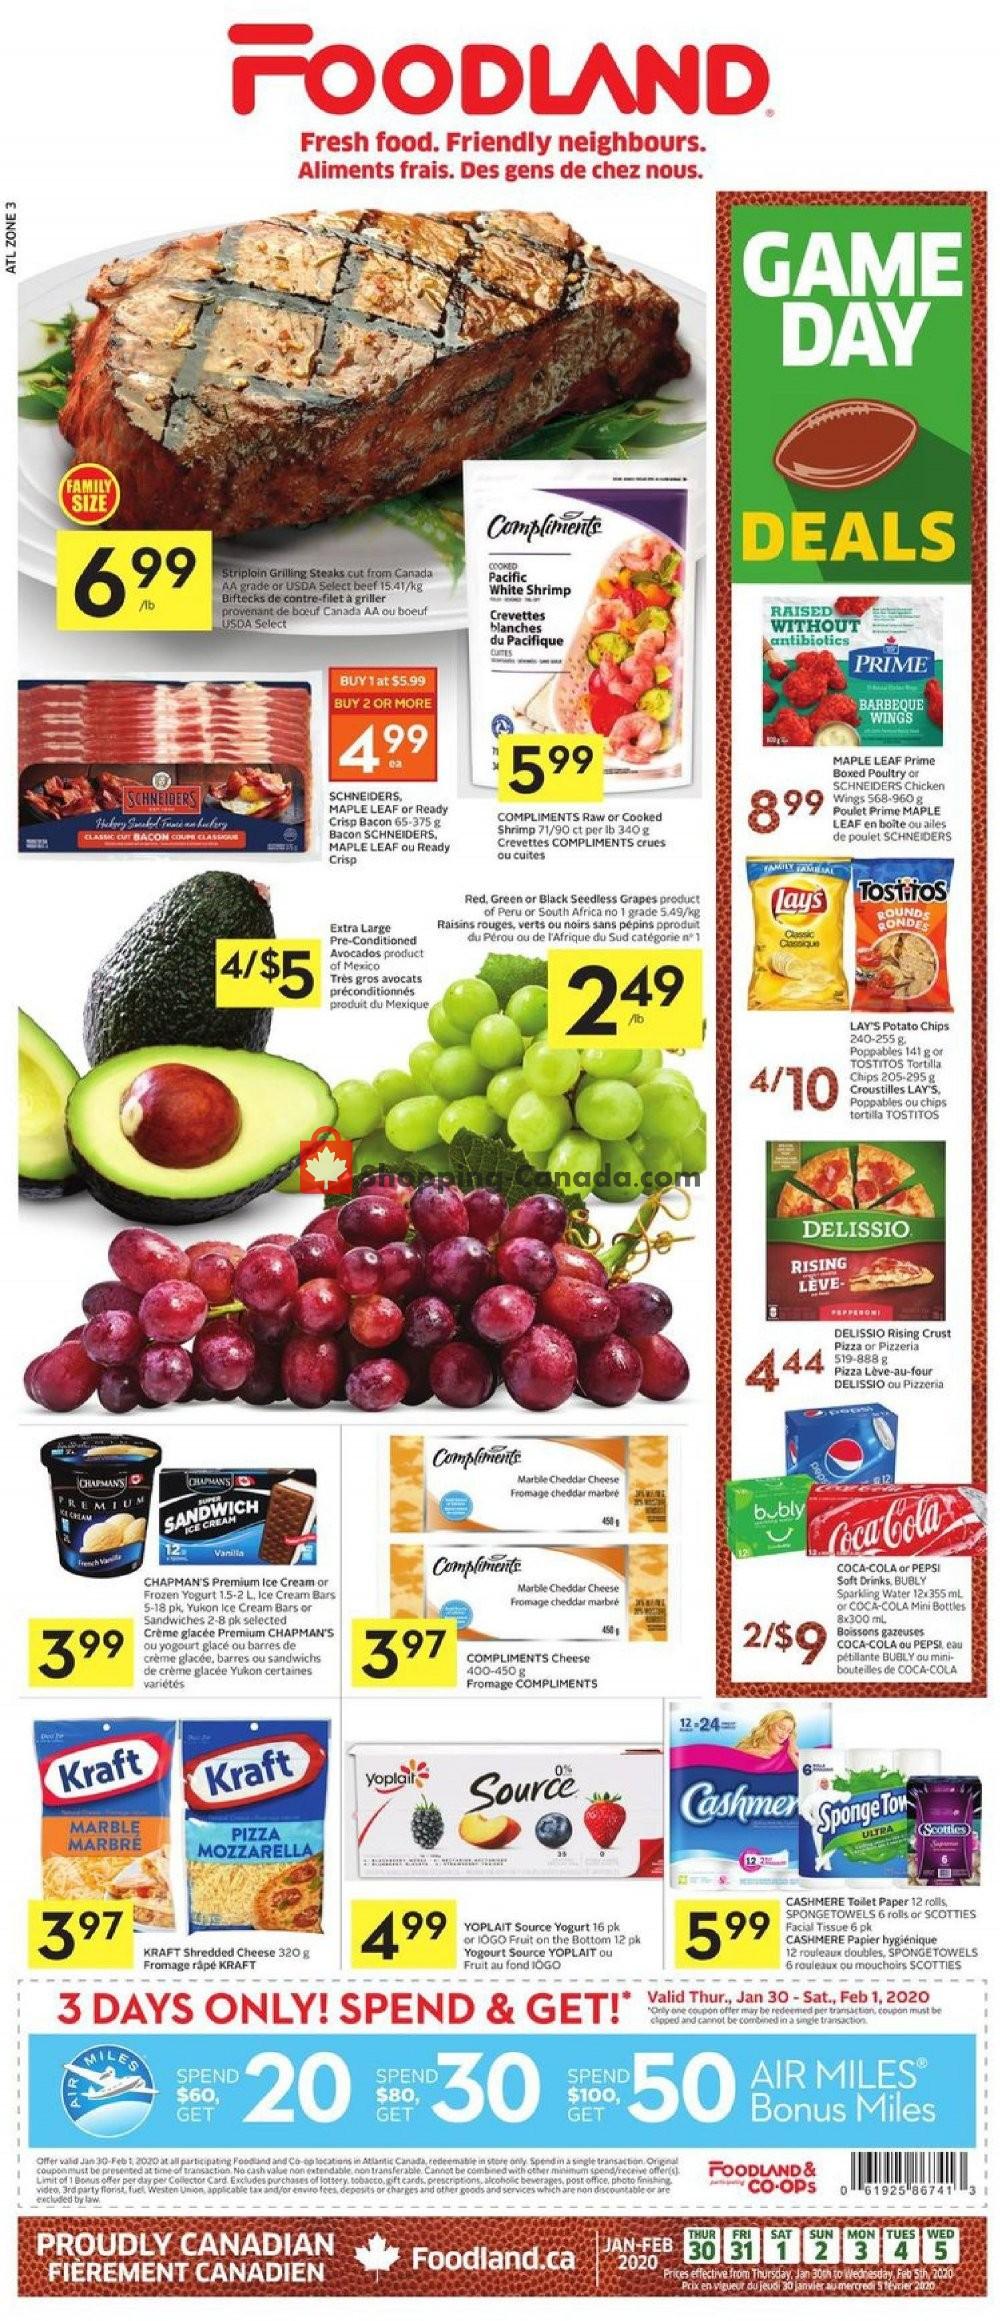 Flyer Foodland Canada - from Thursday January 30, 2020 to Wednesday February 5, 2020